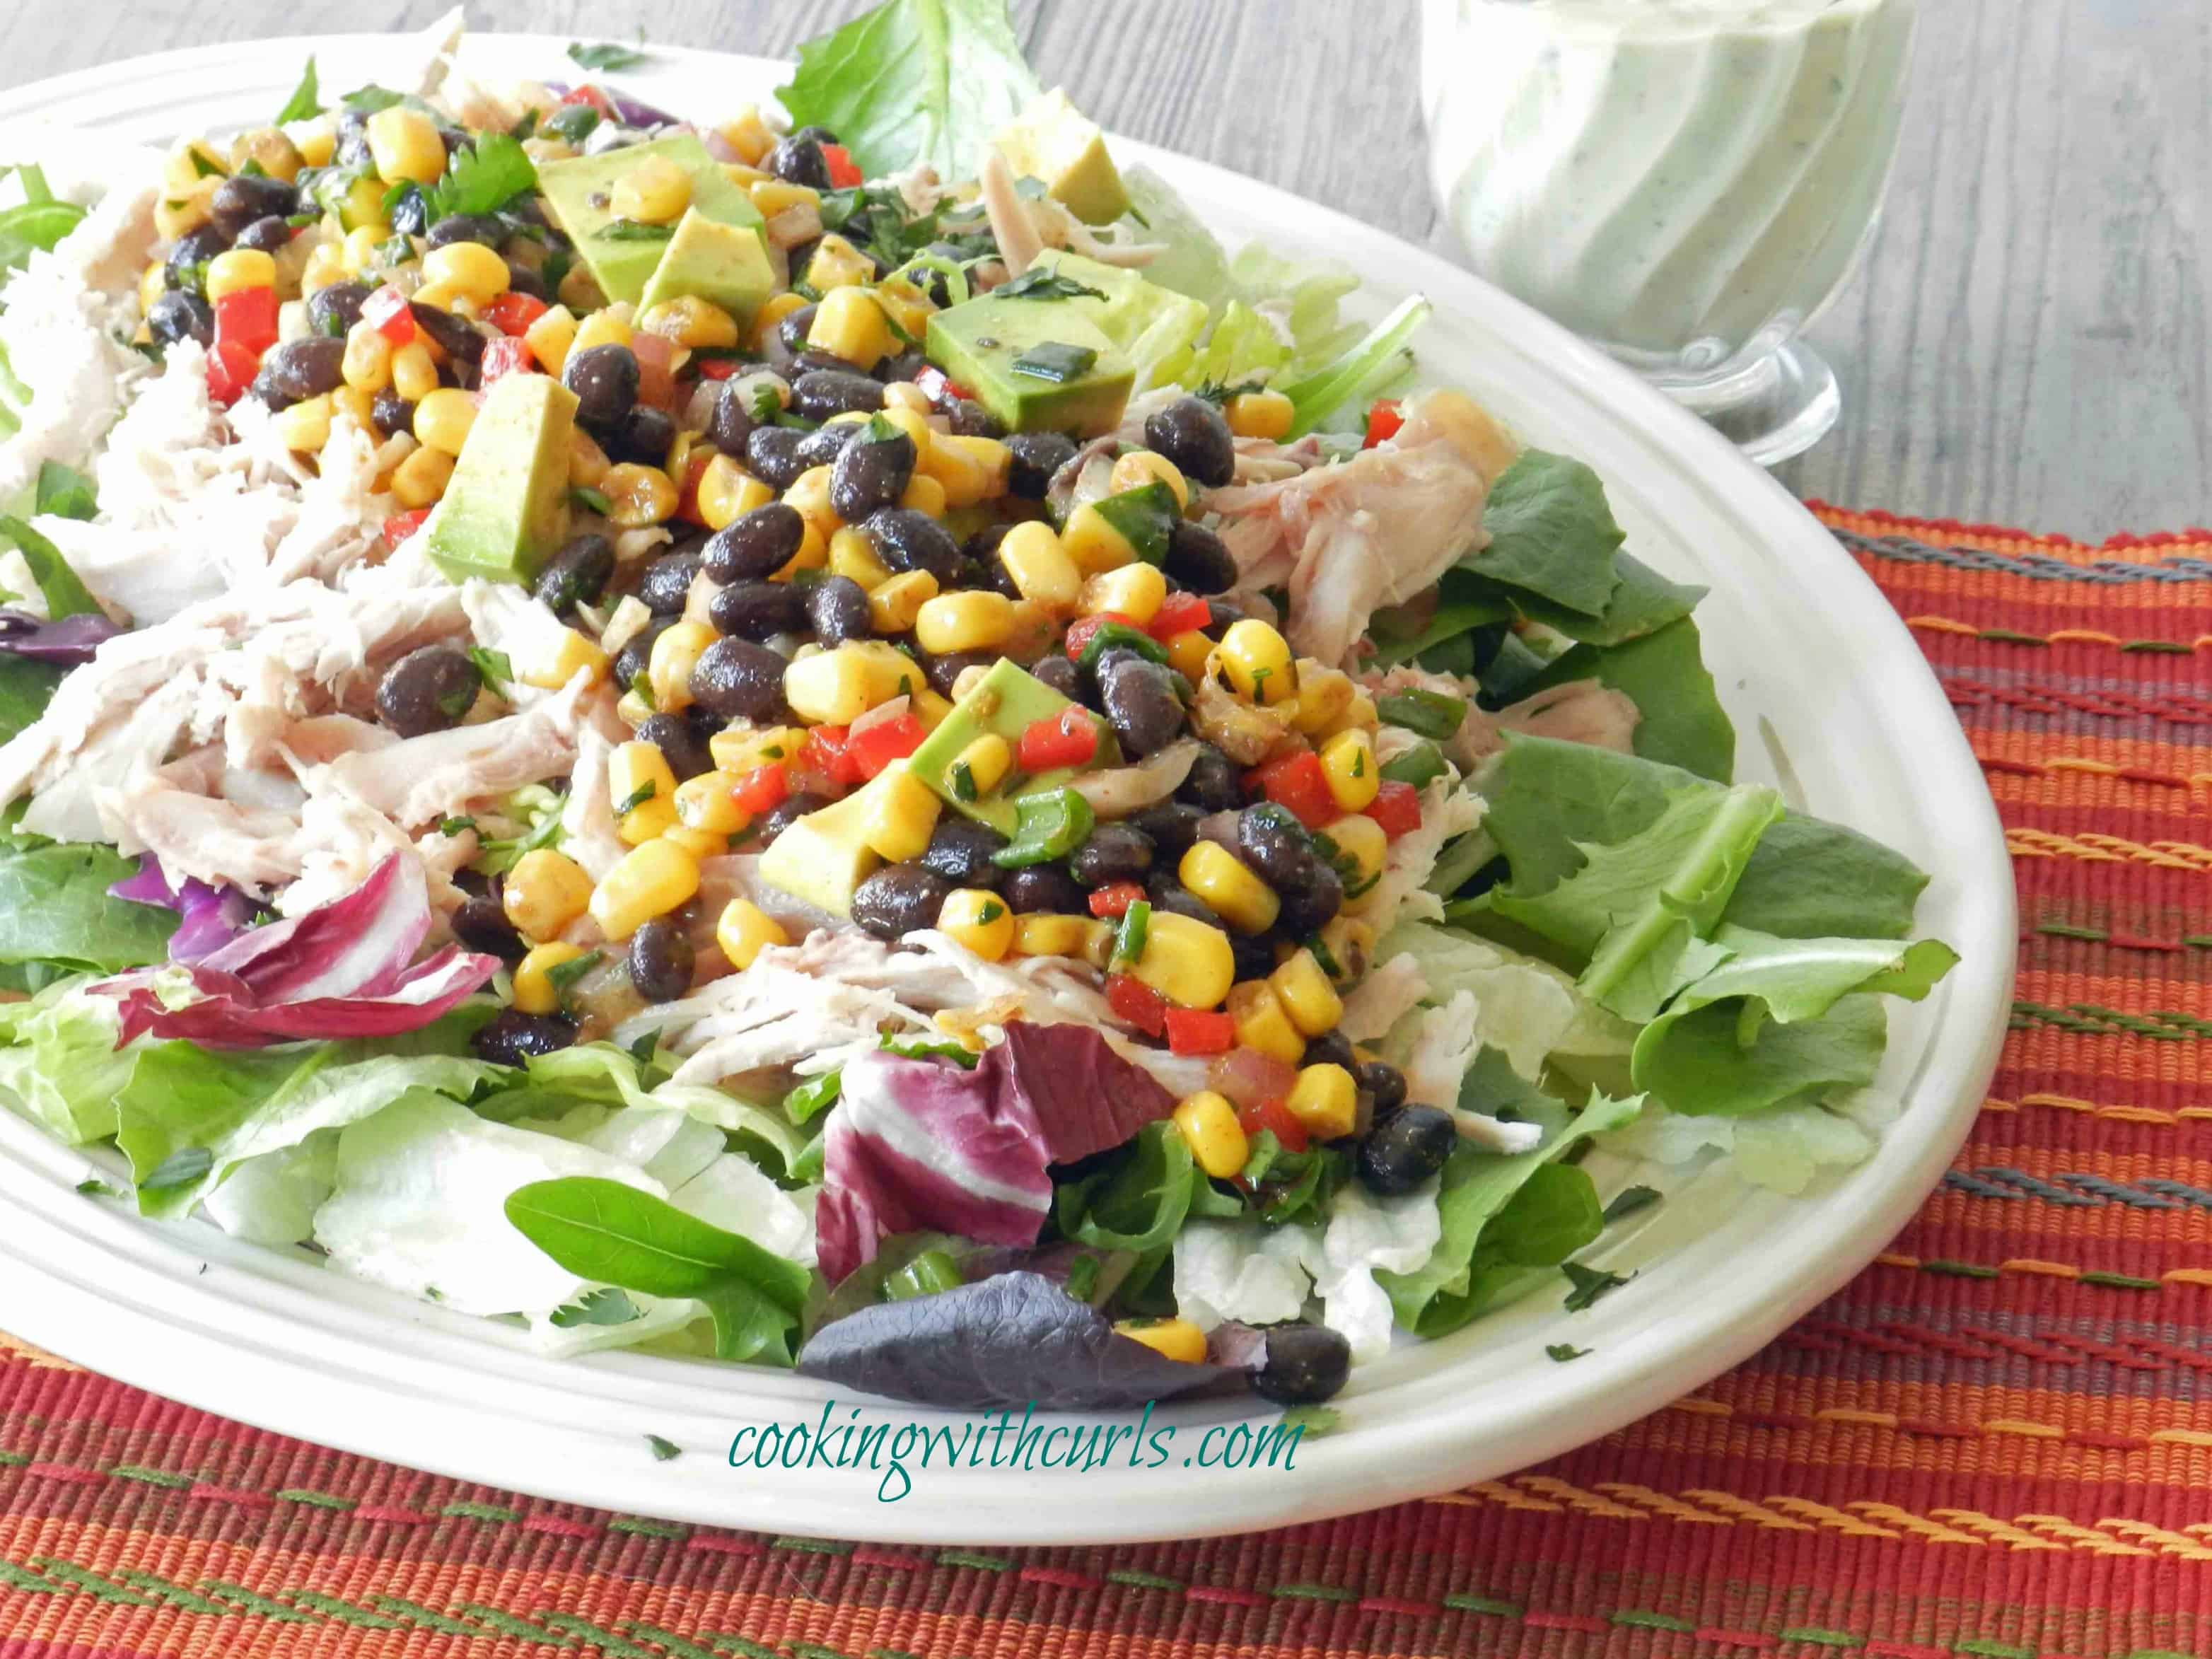 Southwest Chicken Salad Spring & organization - Cooking With Curls